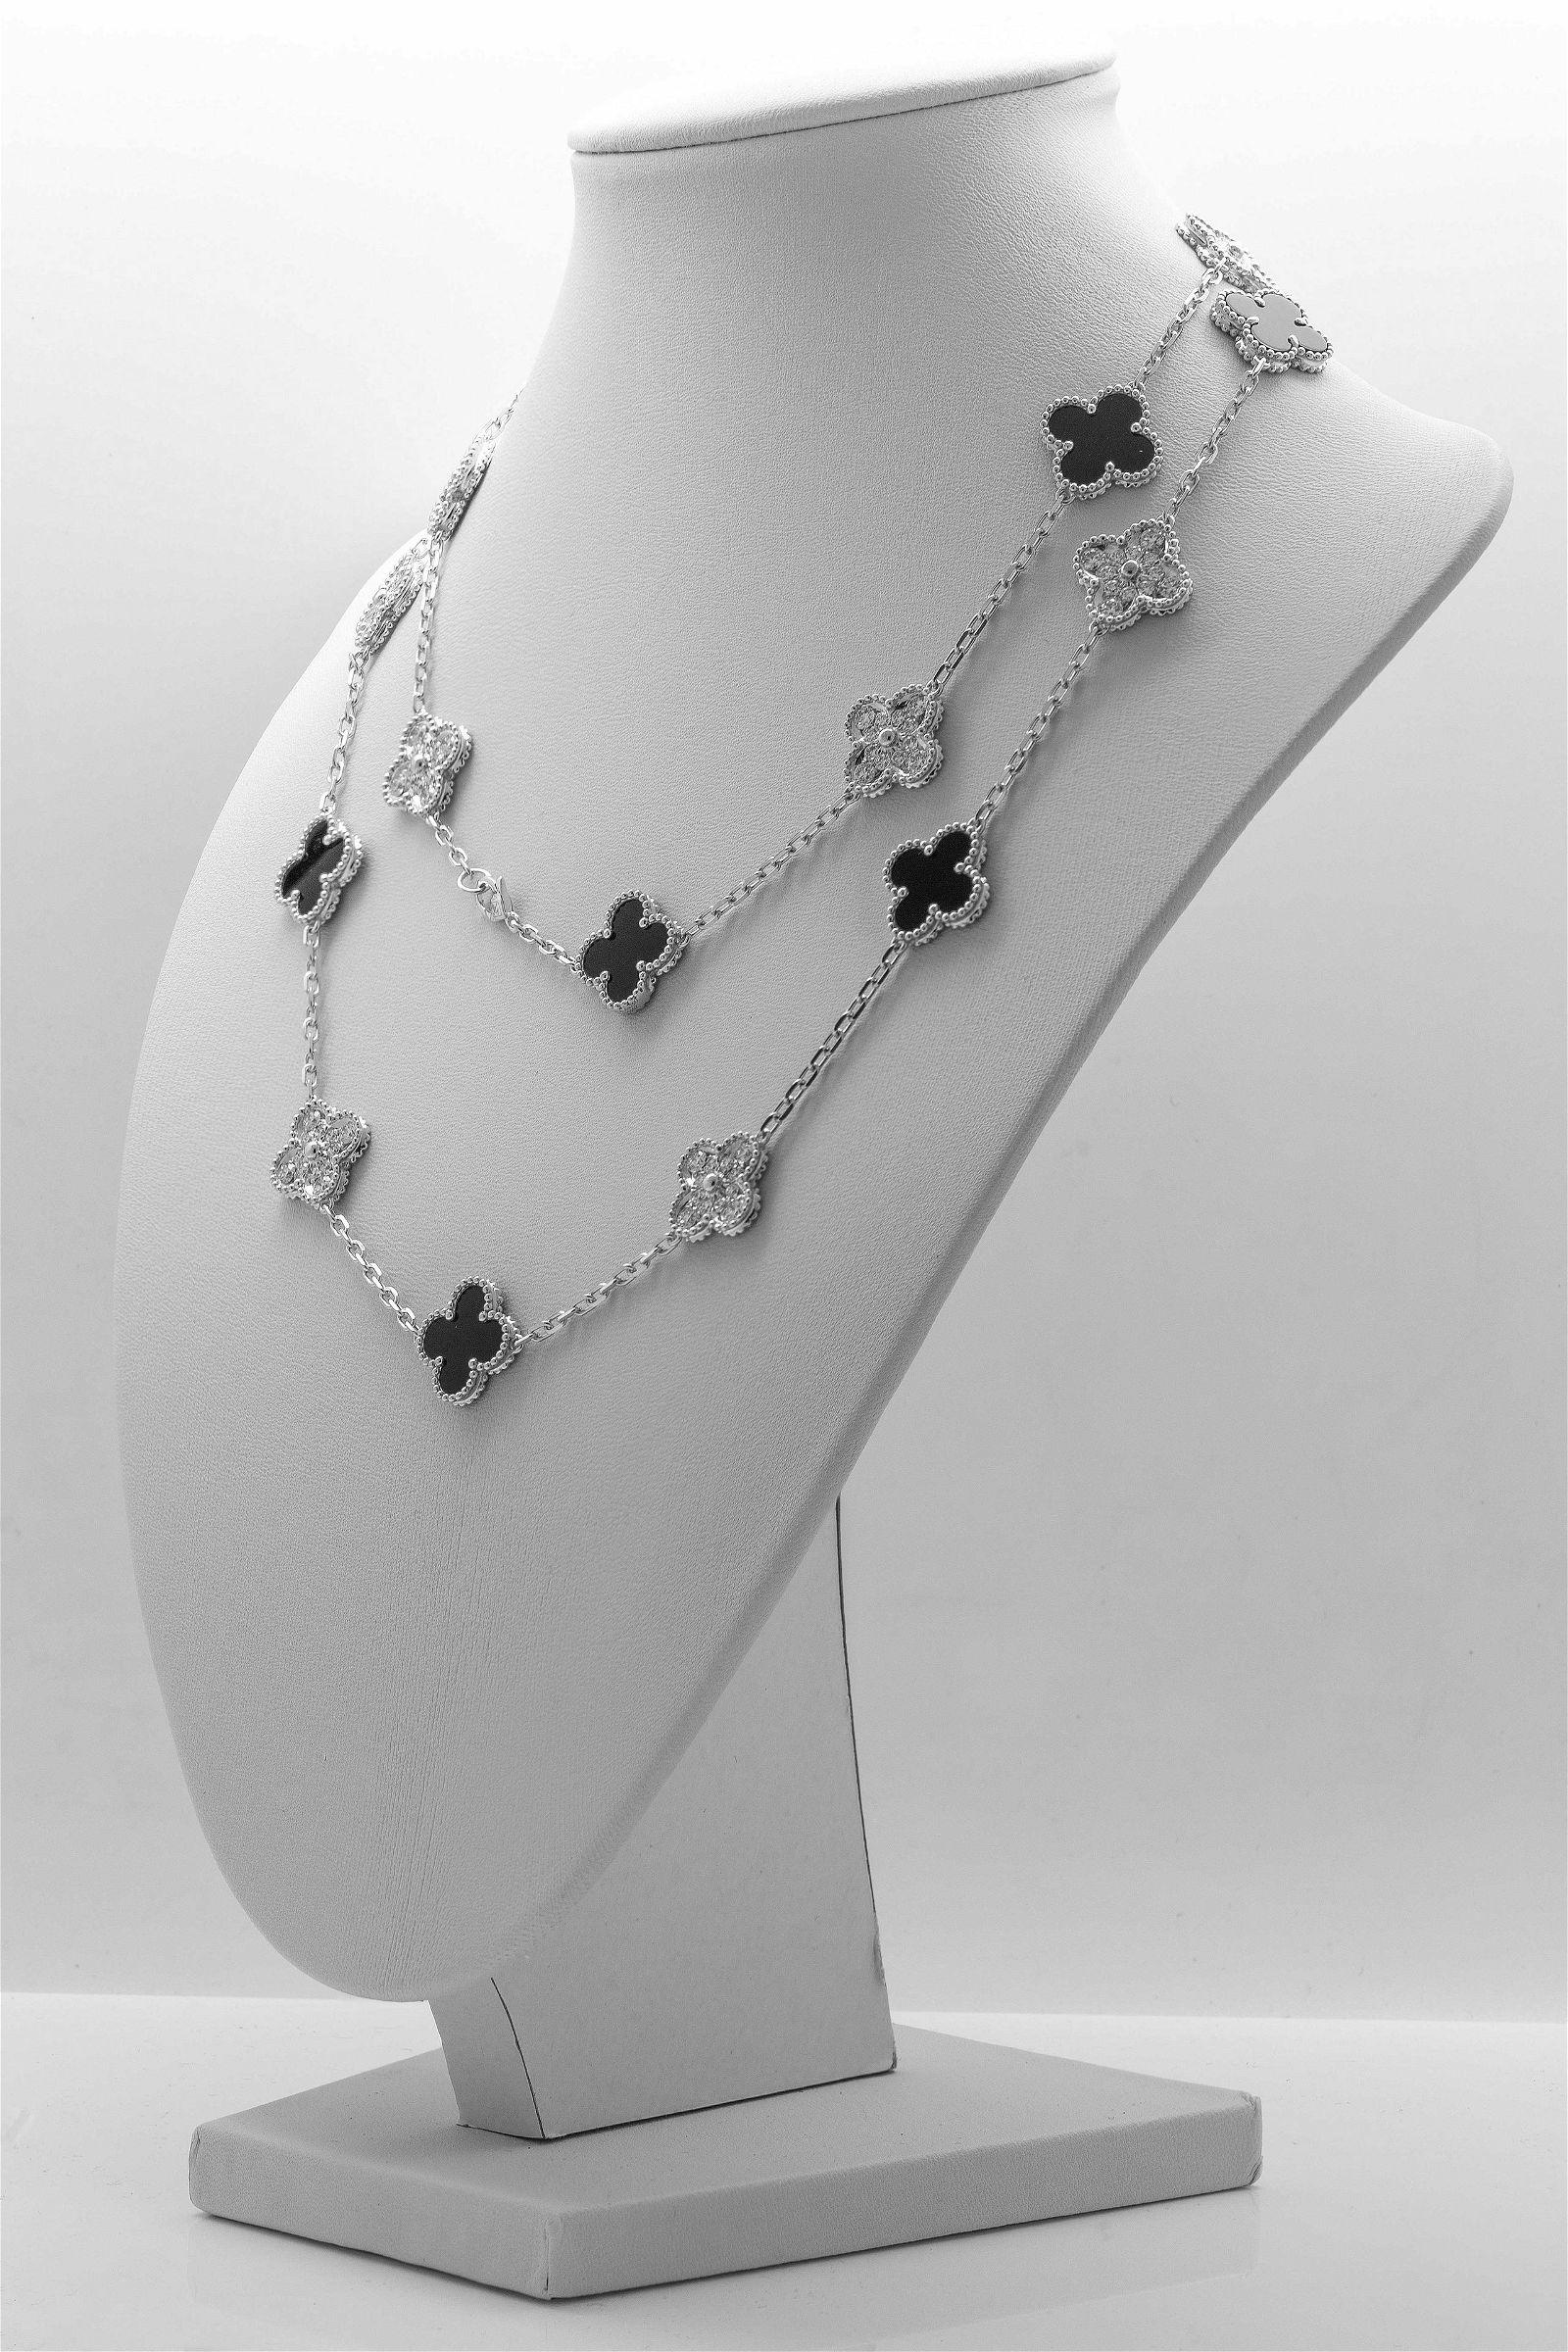 Van Cleef & Arpels Vintage Alhambra 20 Motif Necklace